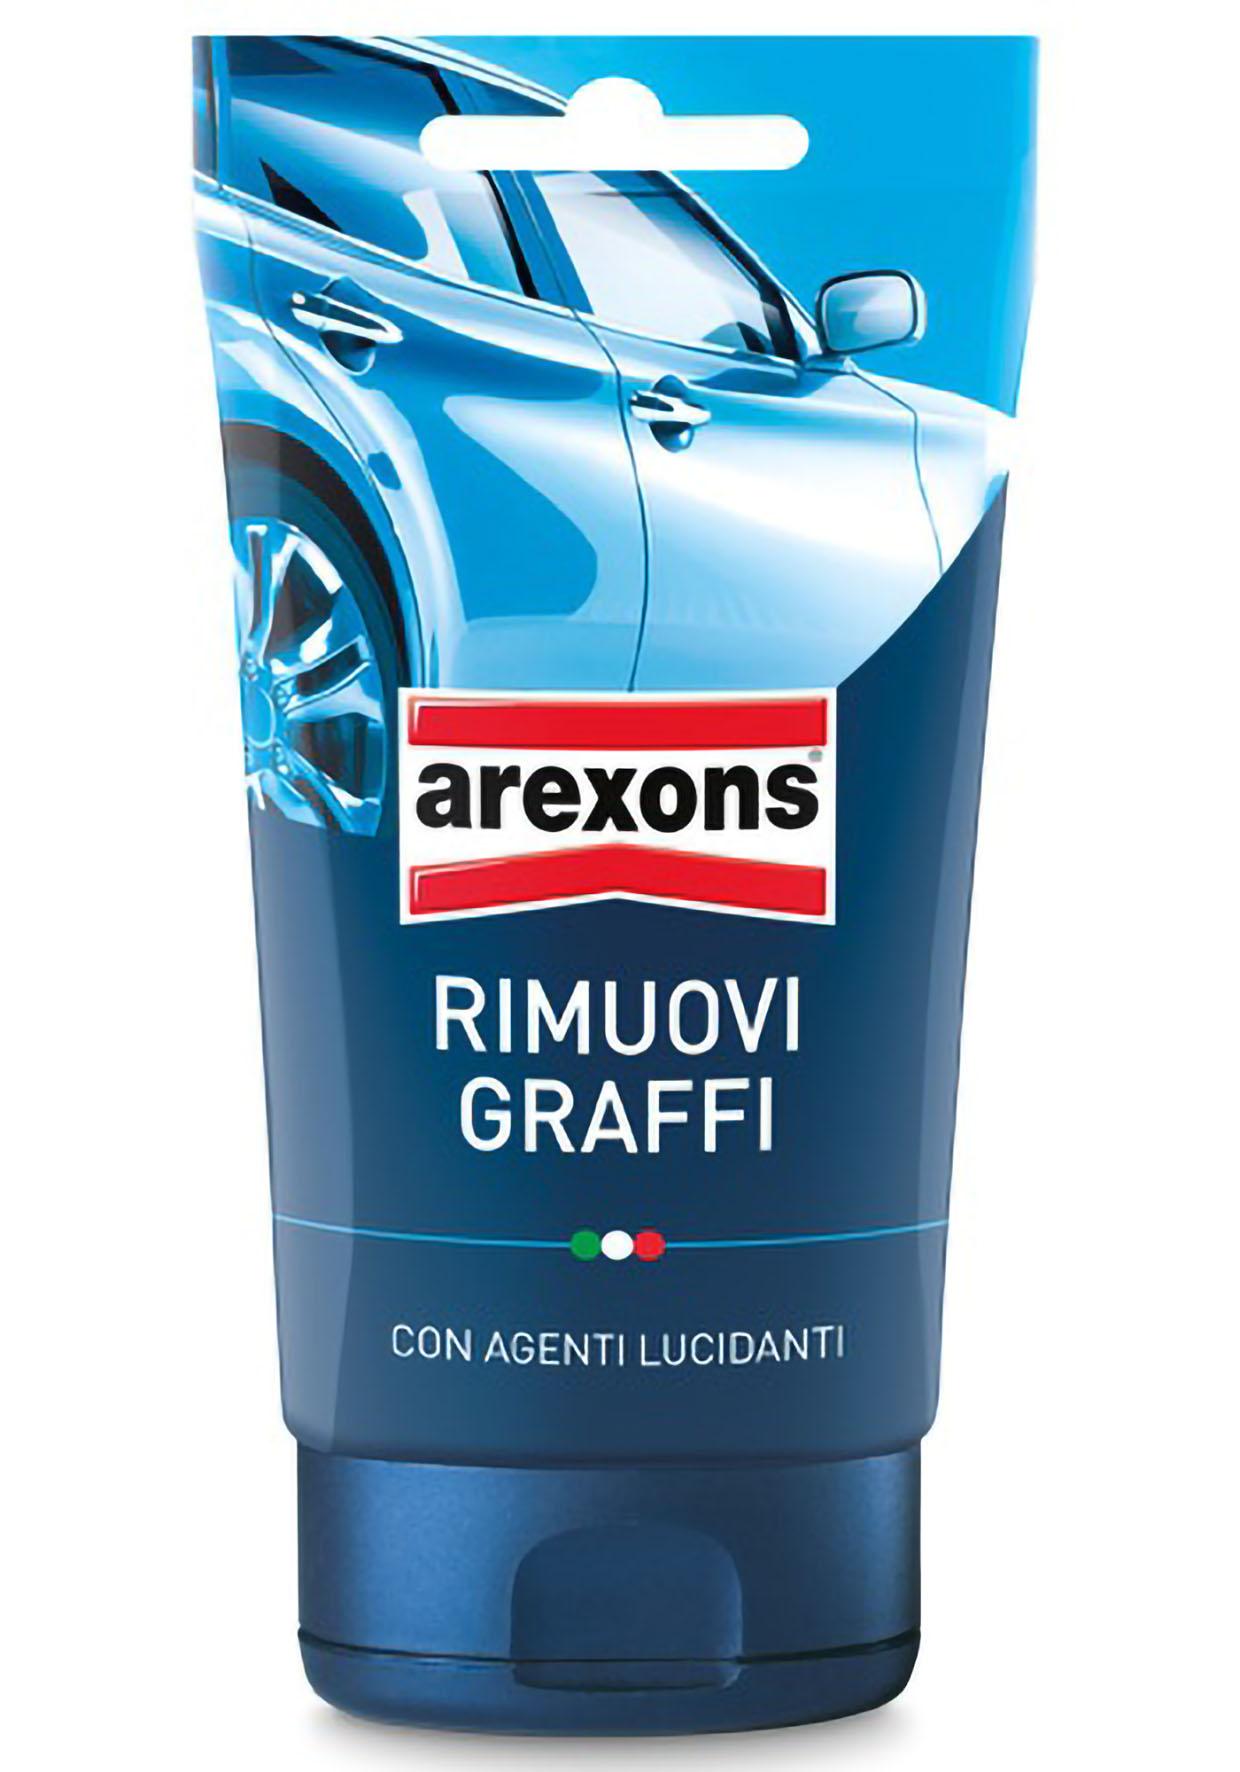 AREXONS RIMUOVI GRAFFI GR 150